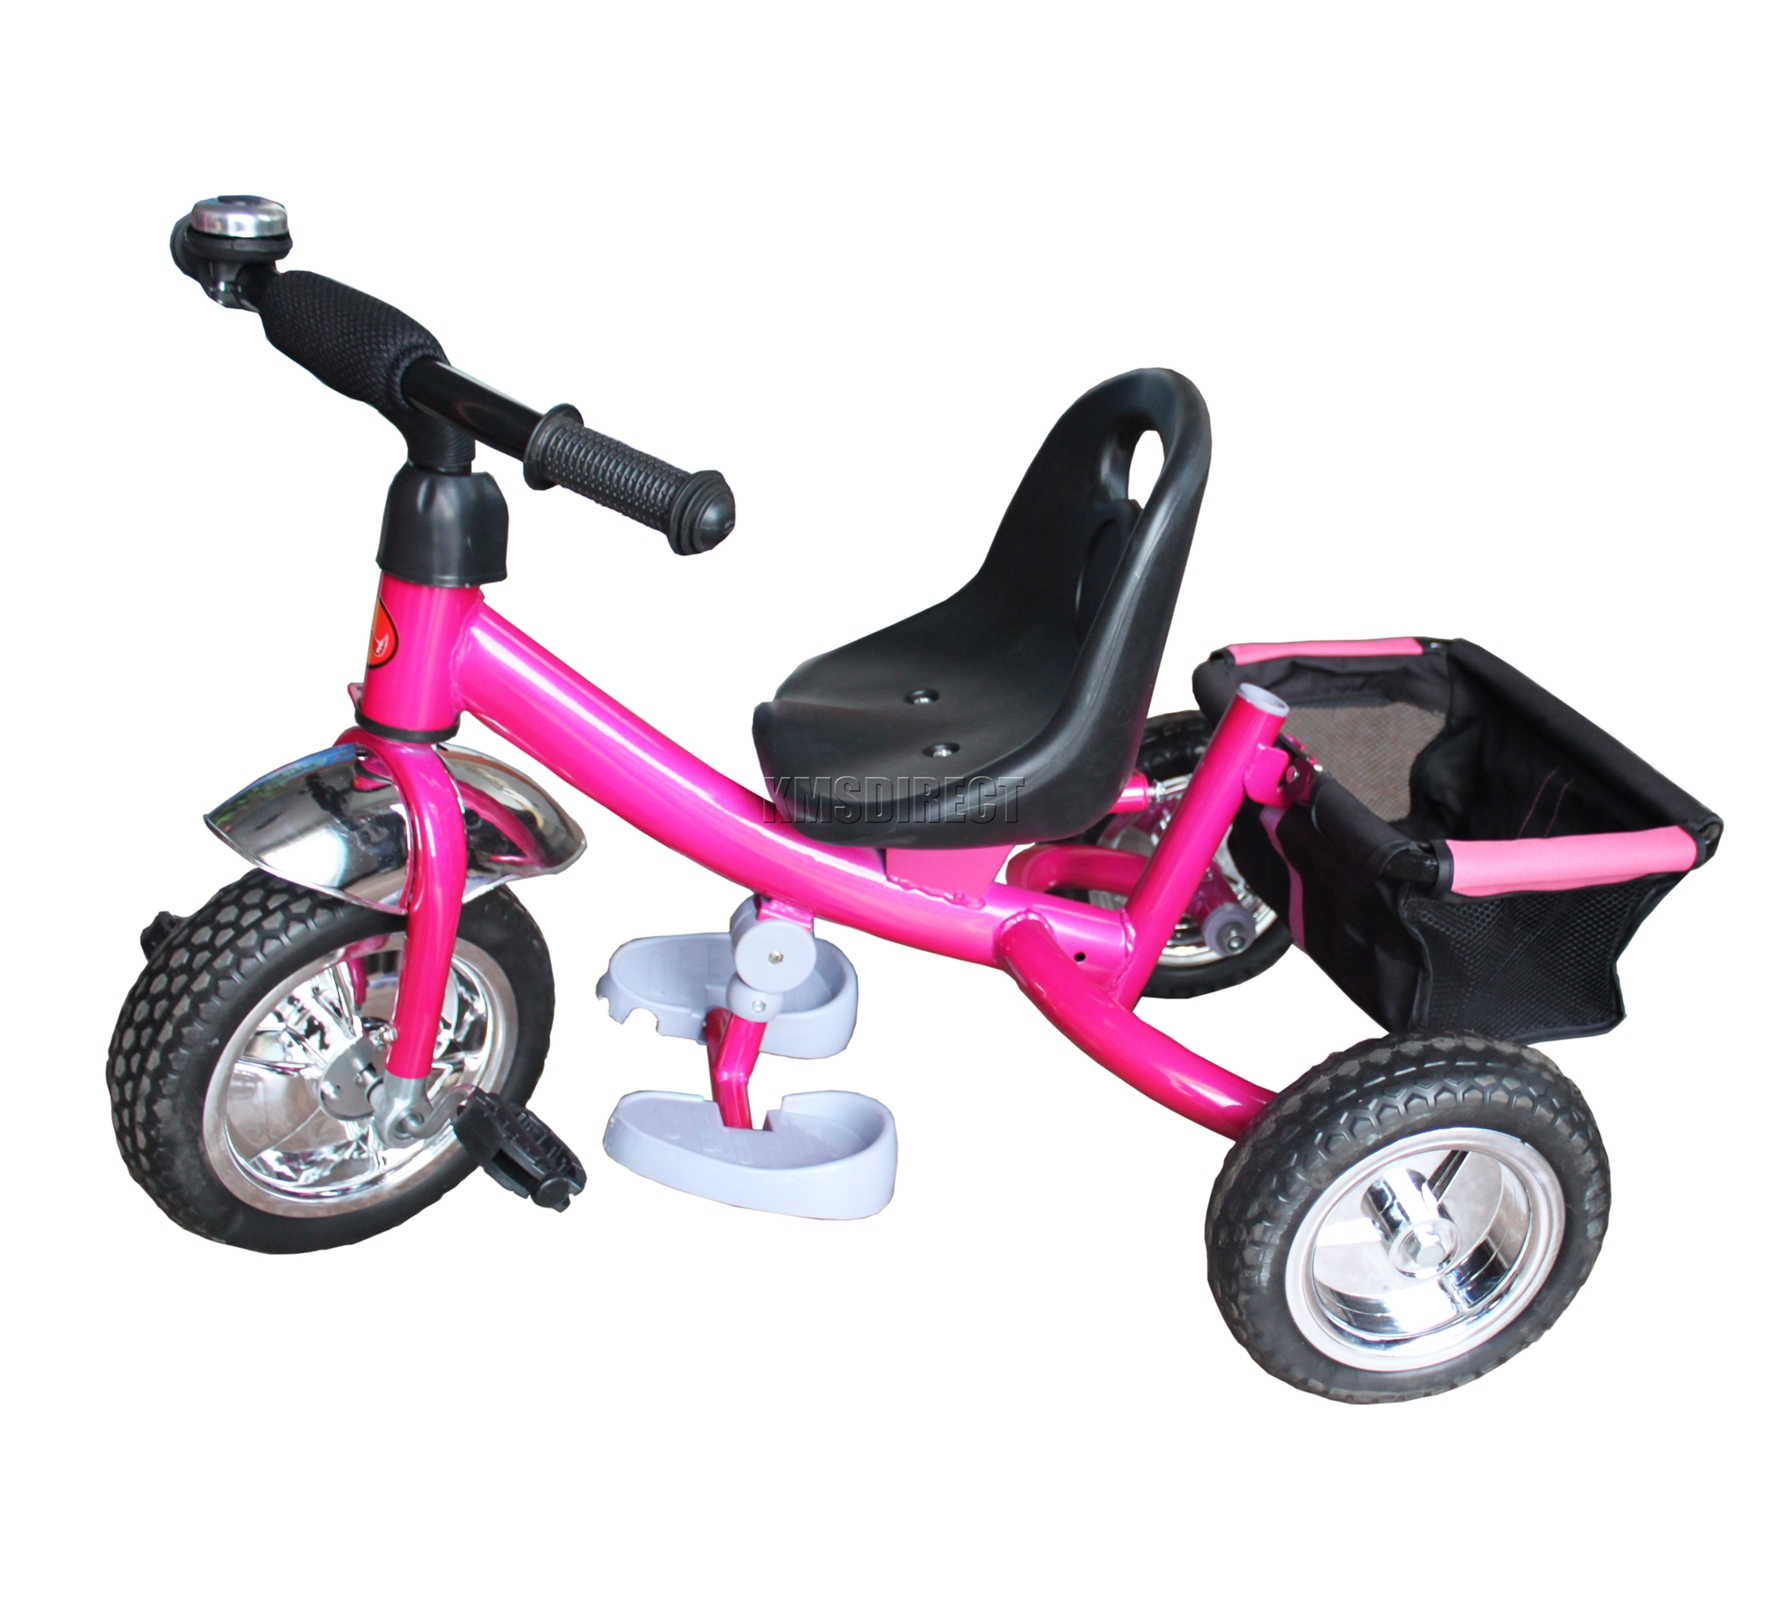 foxhunter 4in1 children kids trike tricycle 3 wheel ride. Black Bedroom Furniture Sets. Home Design Ideas